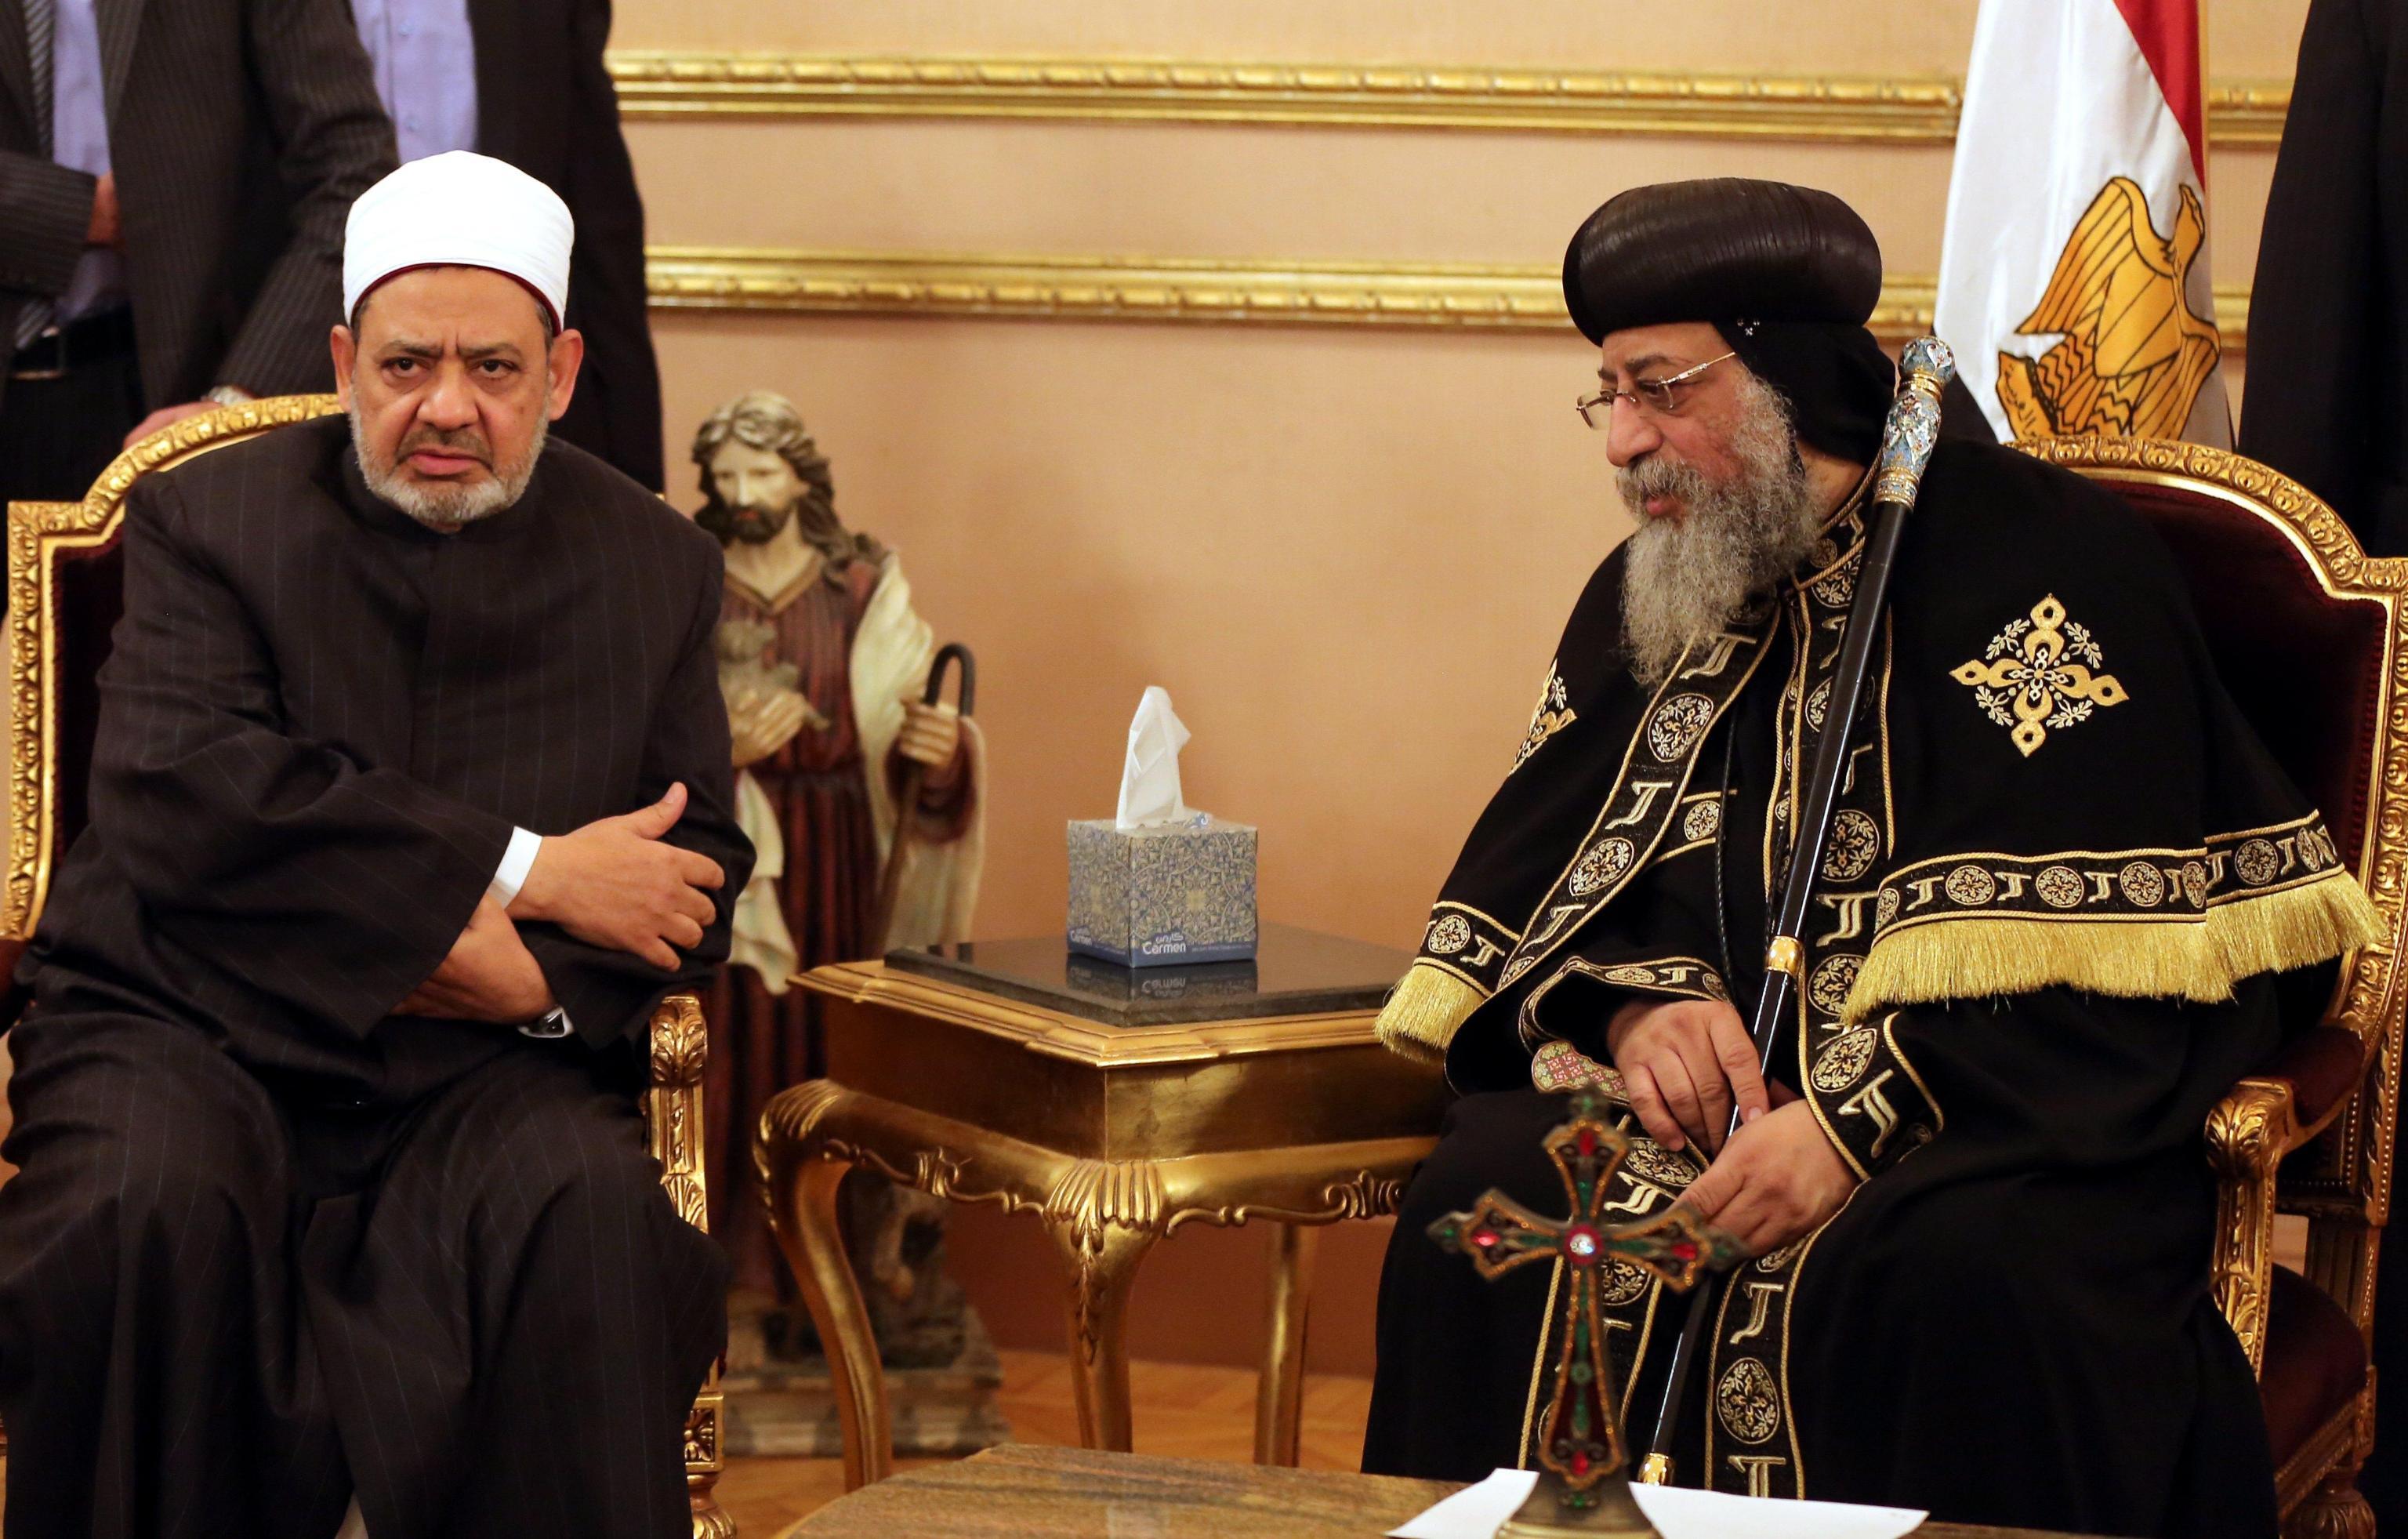 Gerusalemme, Papa copto non vedrà Pence